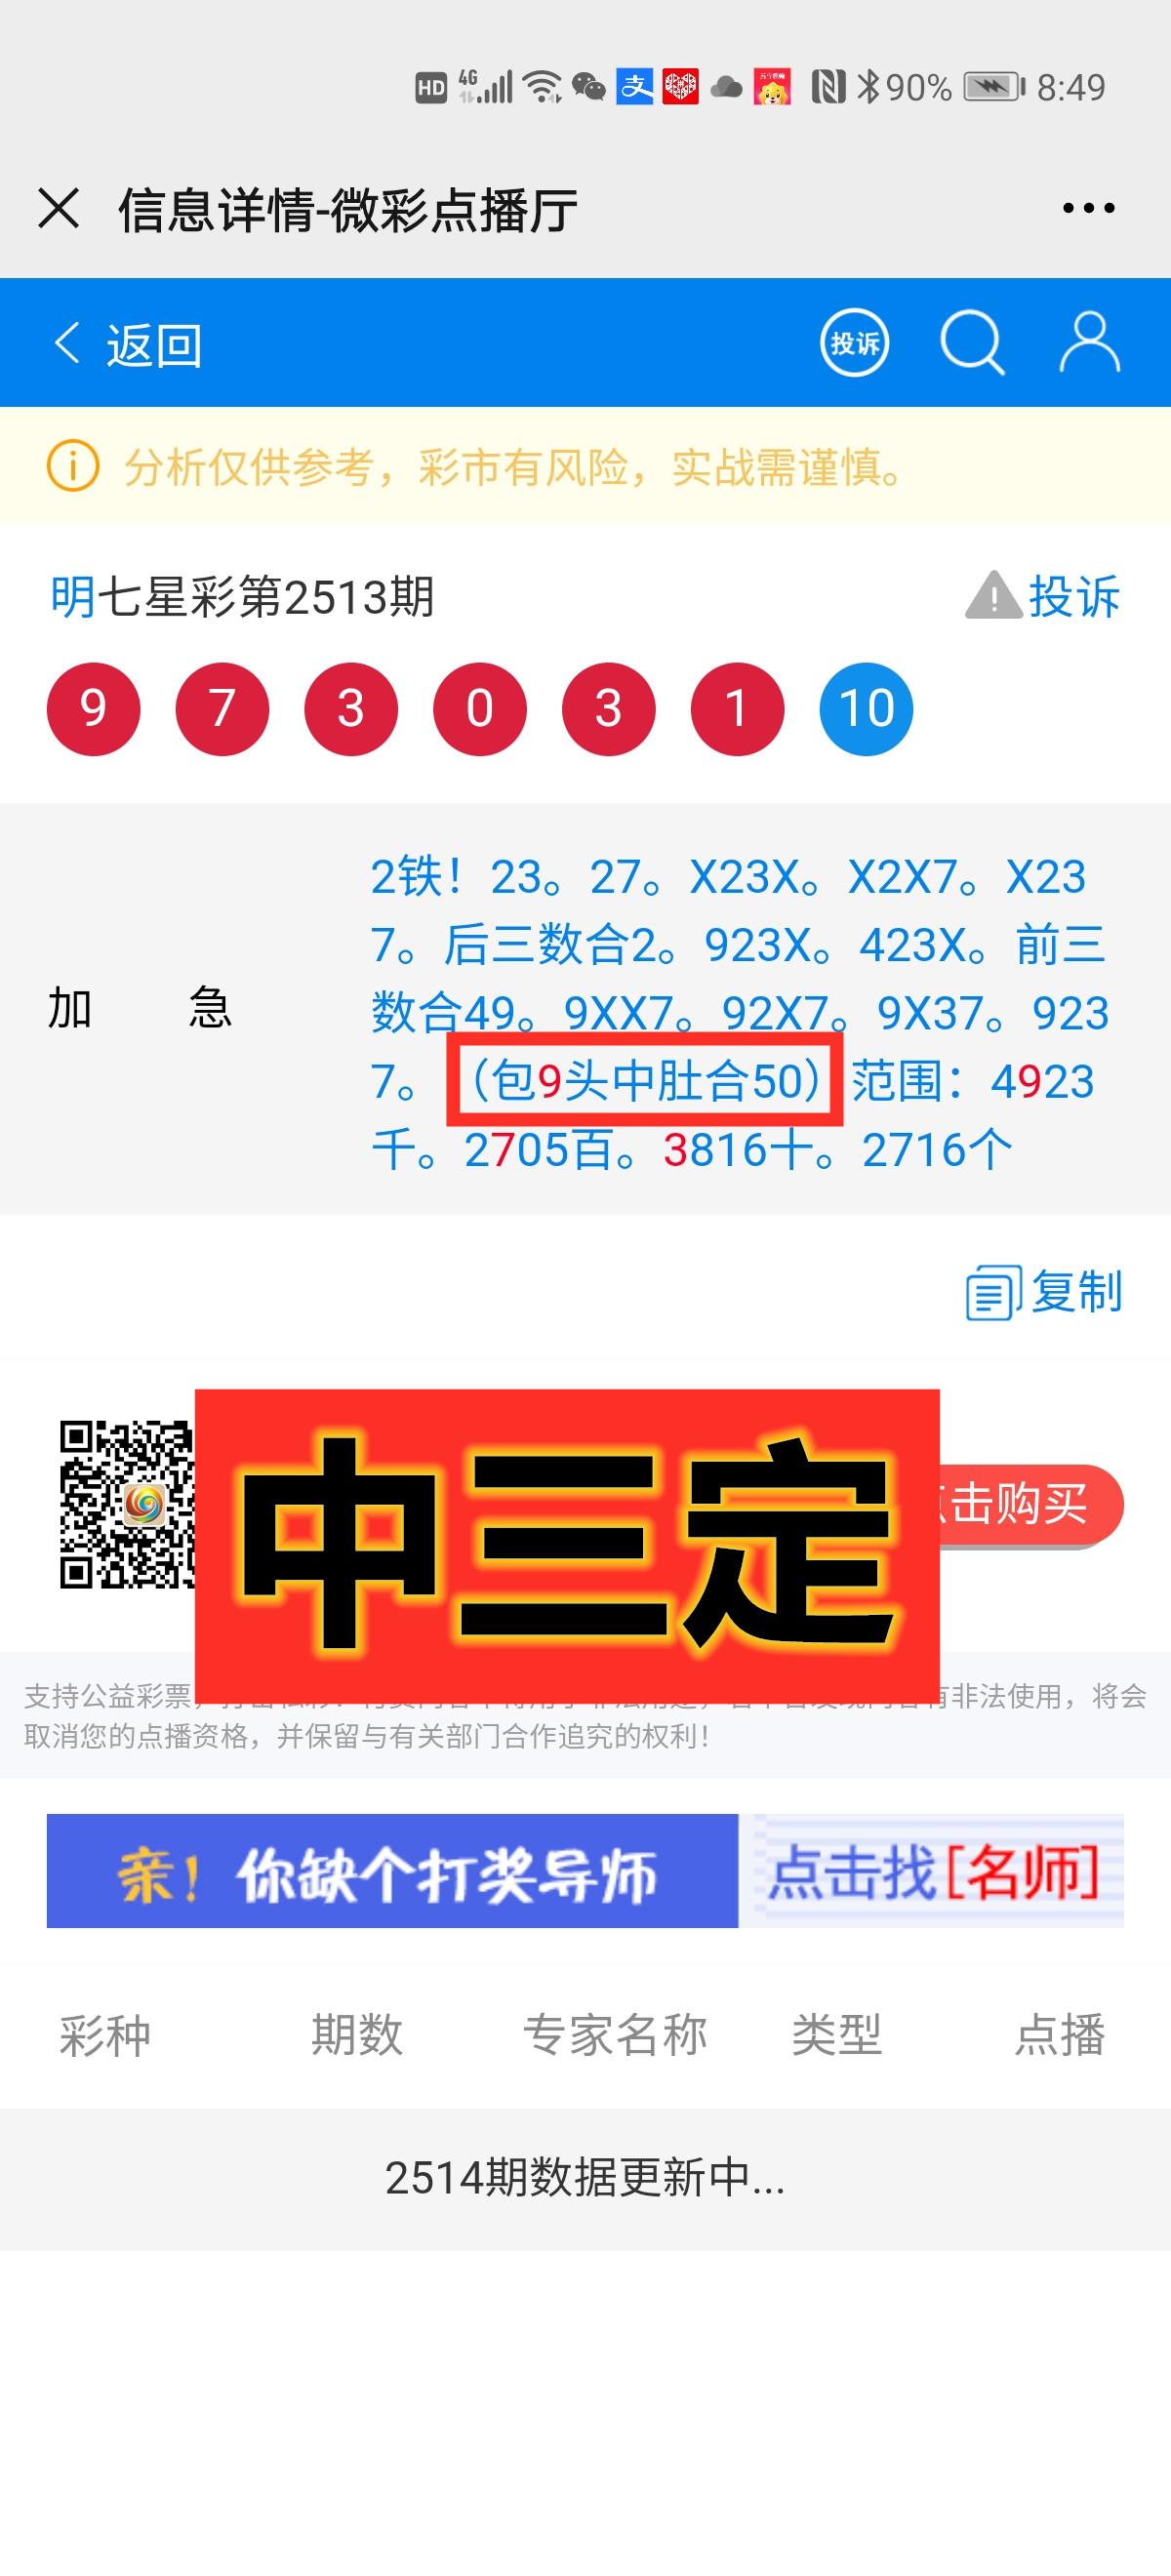 Screenshot_20201120_204911_com.tencent.mm_副本.jpg